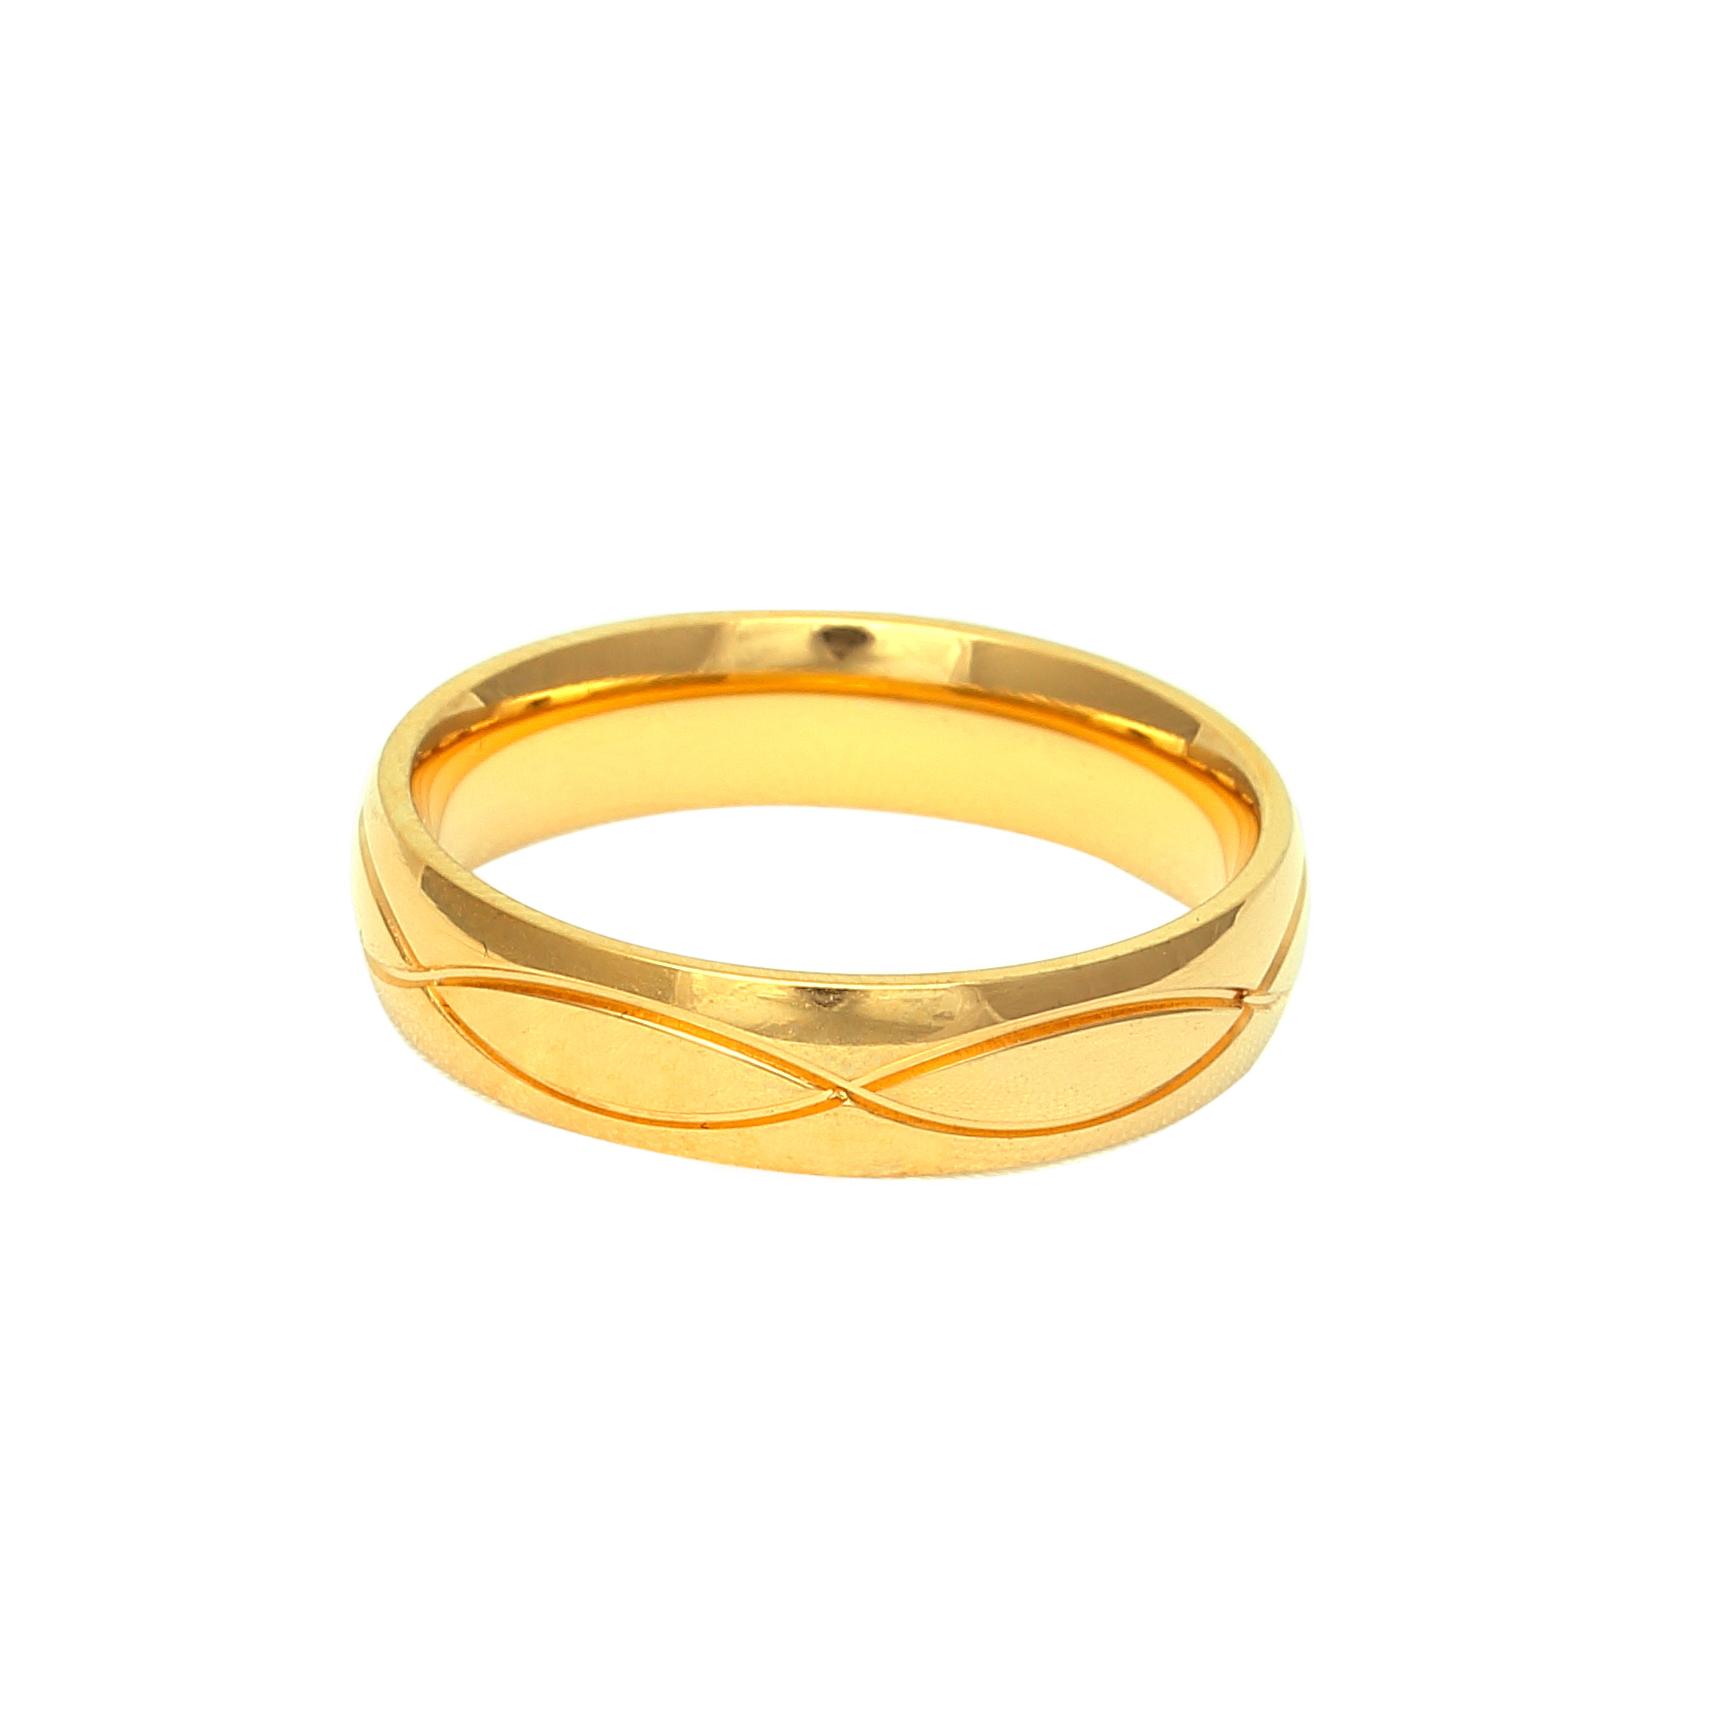 Мъжка златна сватбена халка с релефна декоративна плетеница